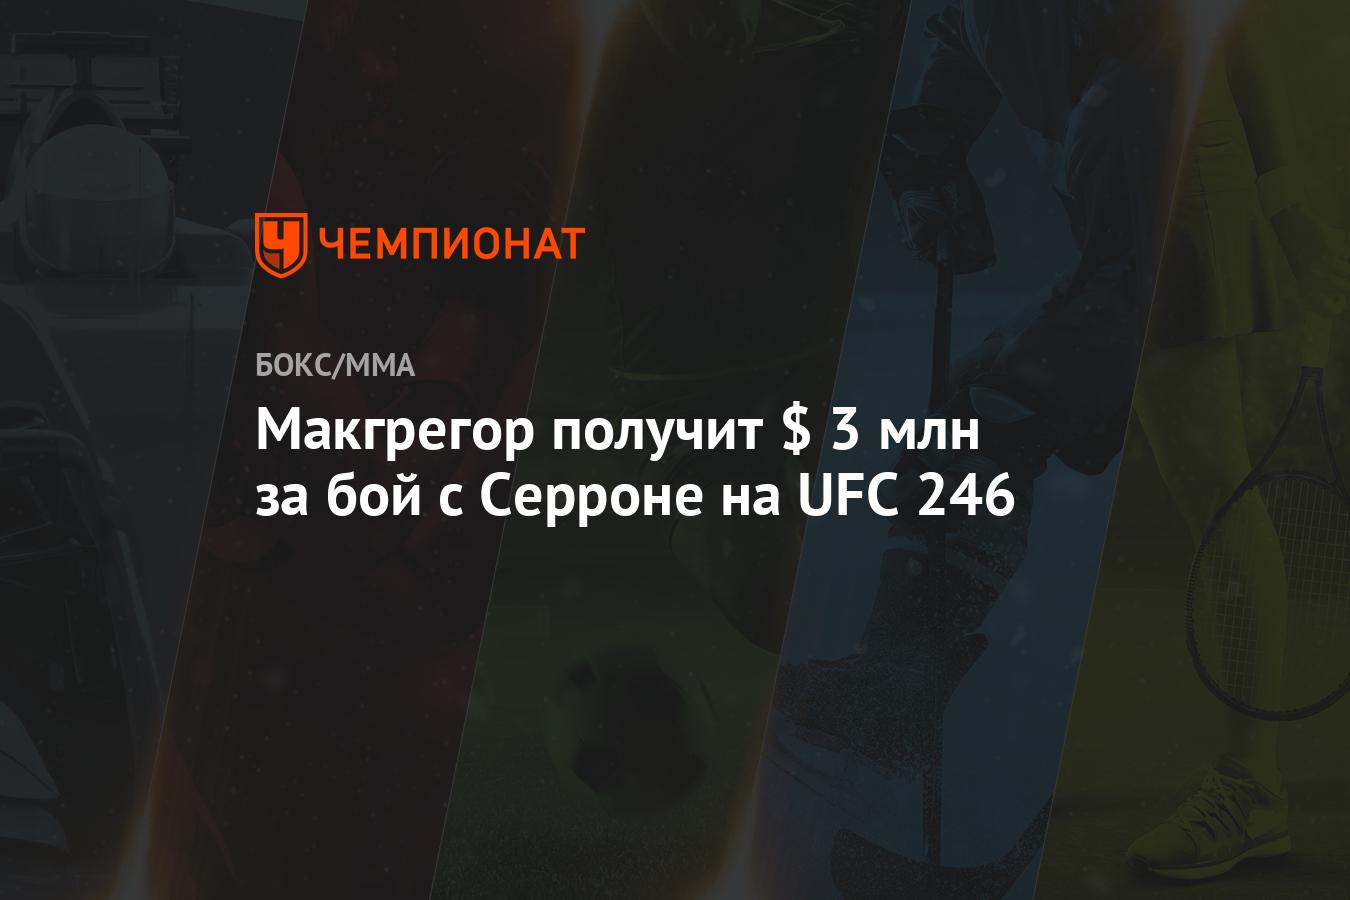 Макгрегор получит $ 3 млн за бой с Серроне на UFC 246